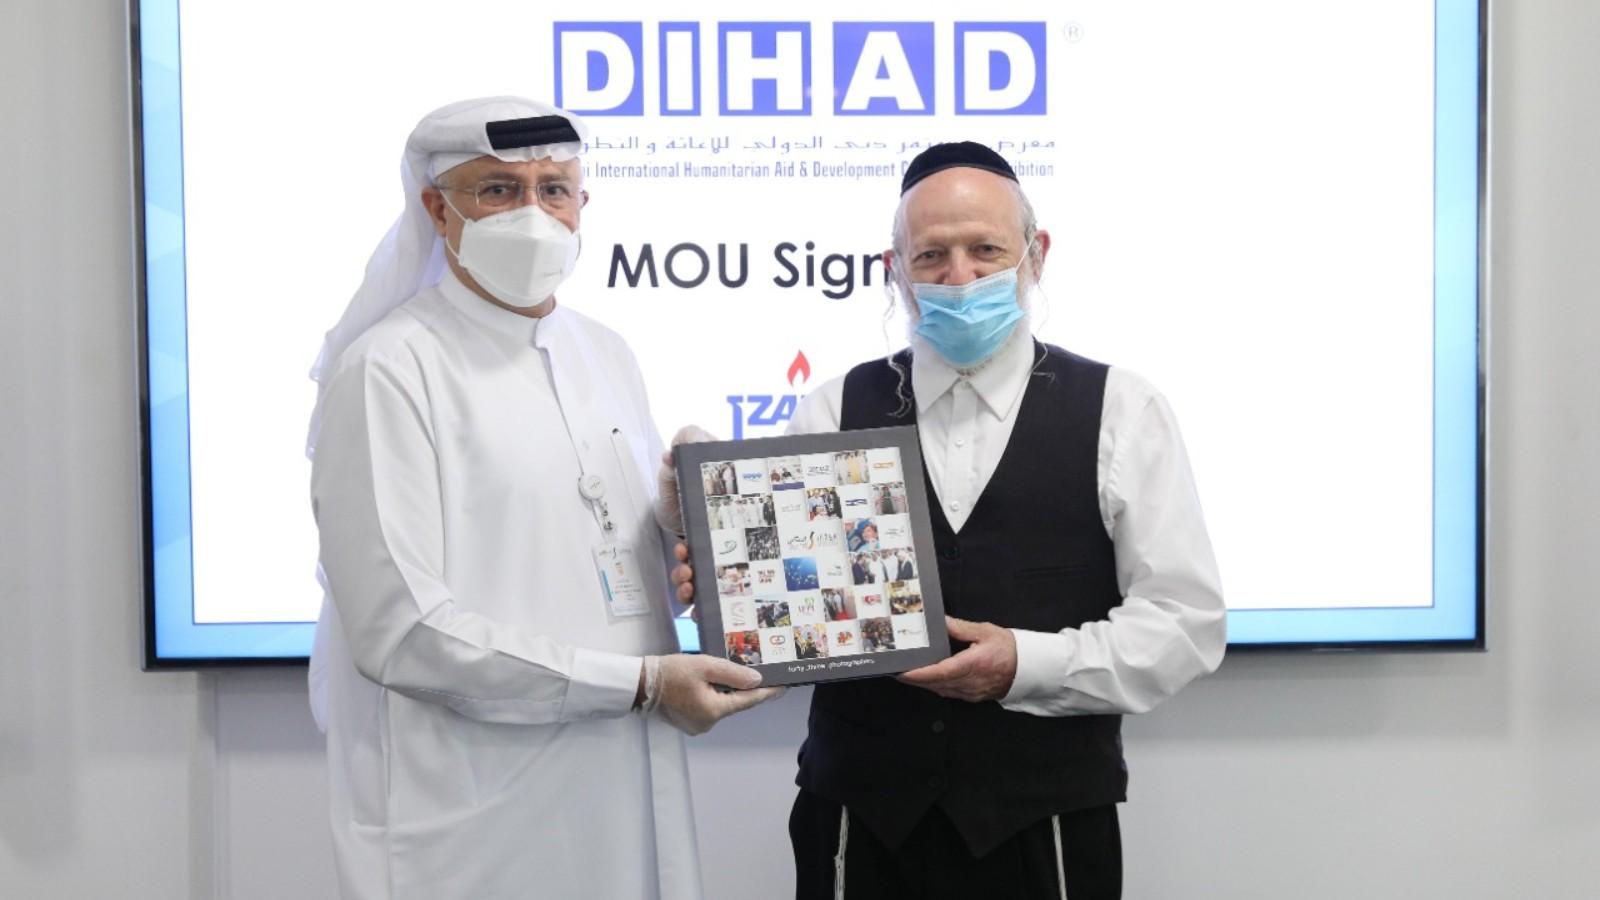 Israeli humanitarian organization signs agreement in Dubai